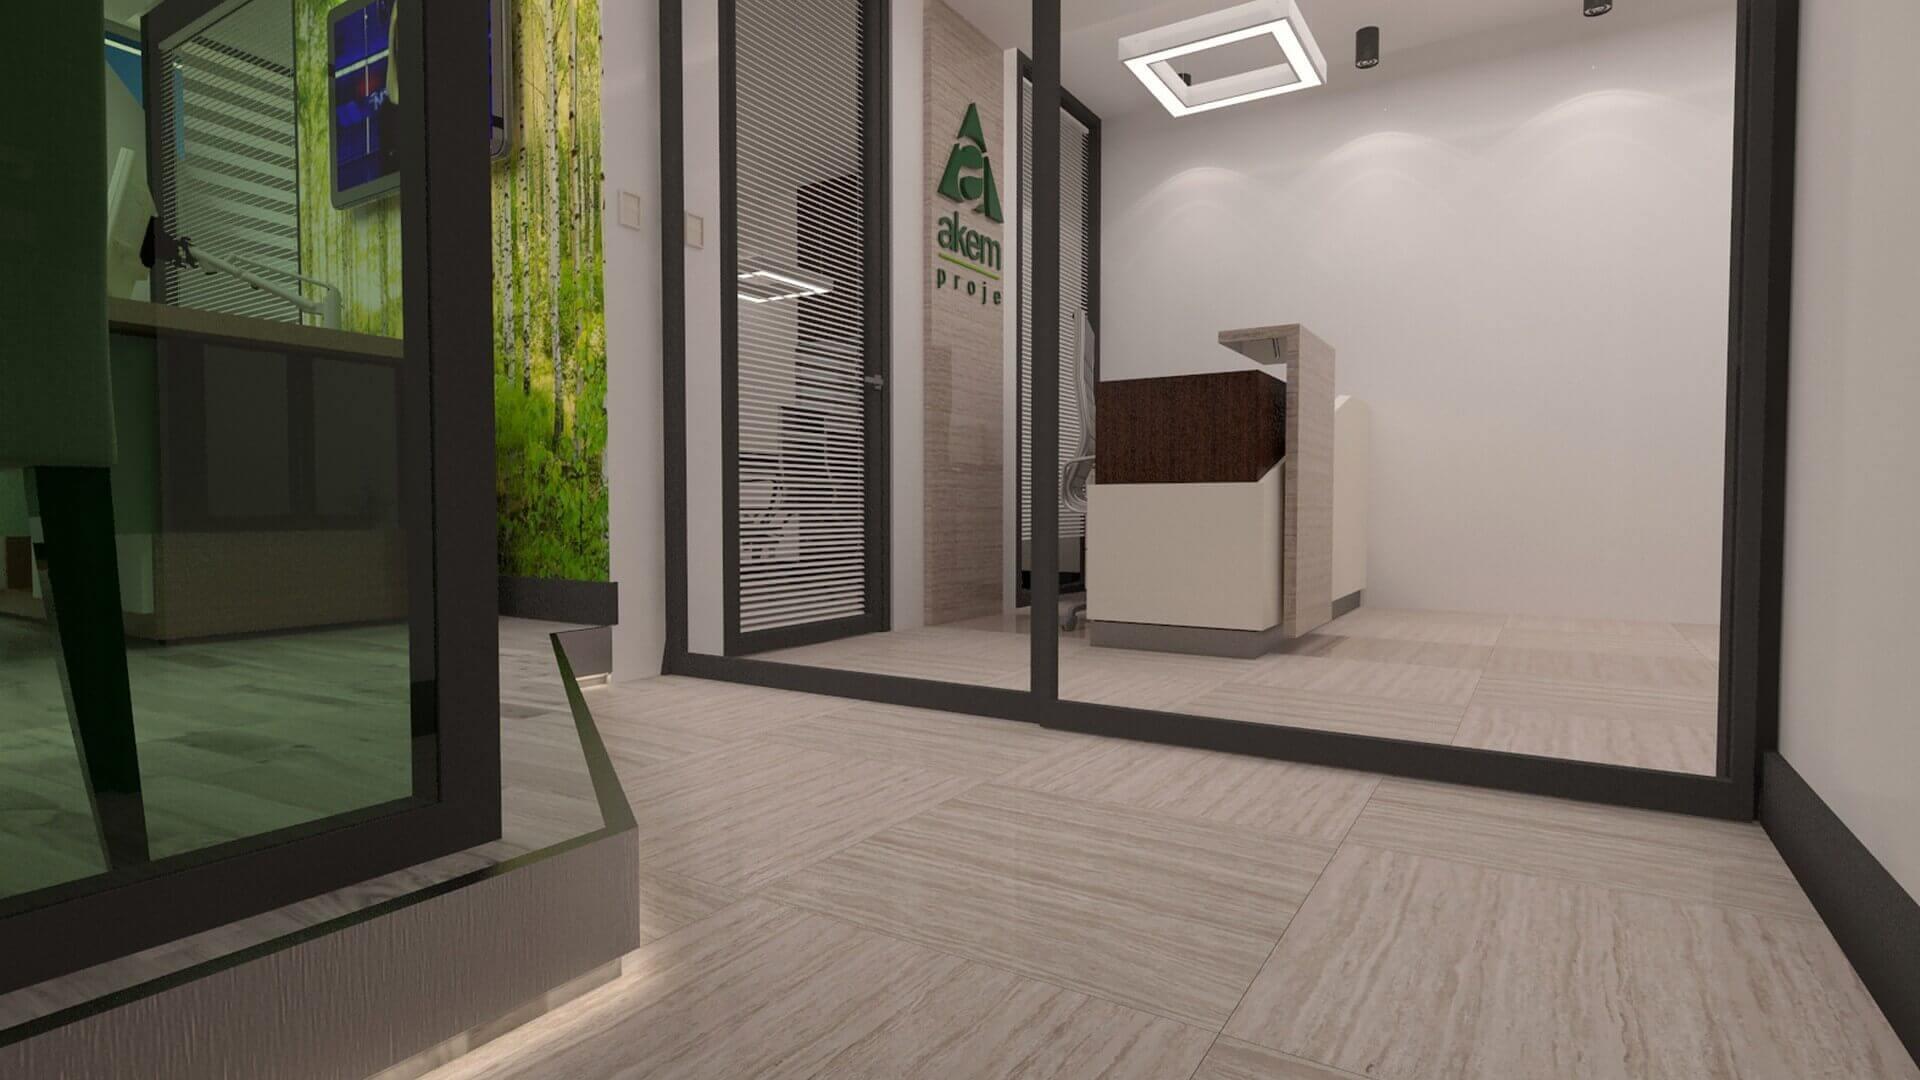 2482 Akem Real Estate Office Offices